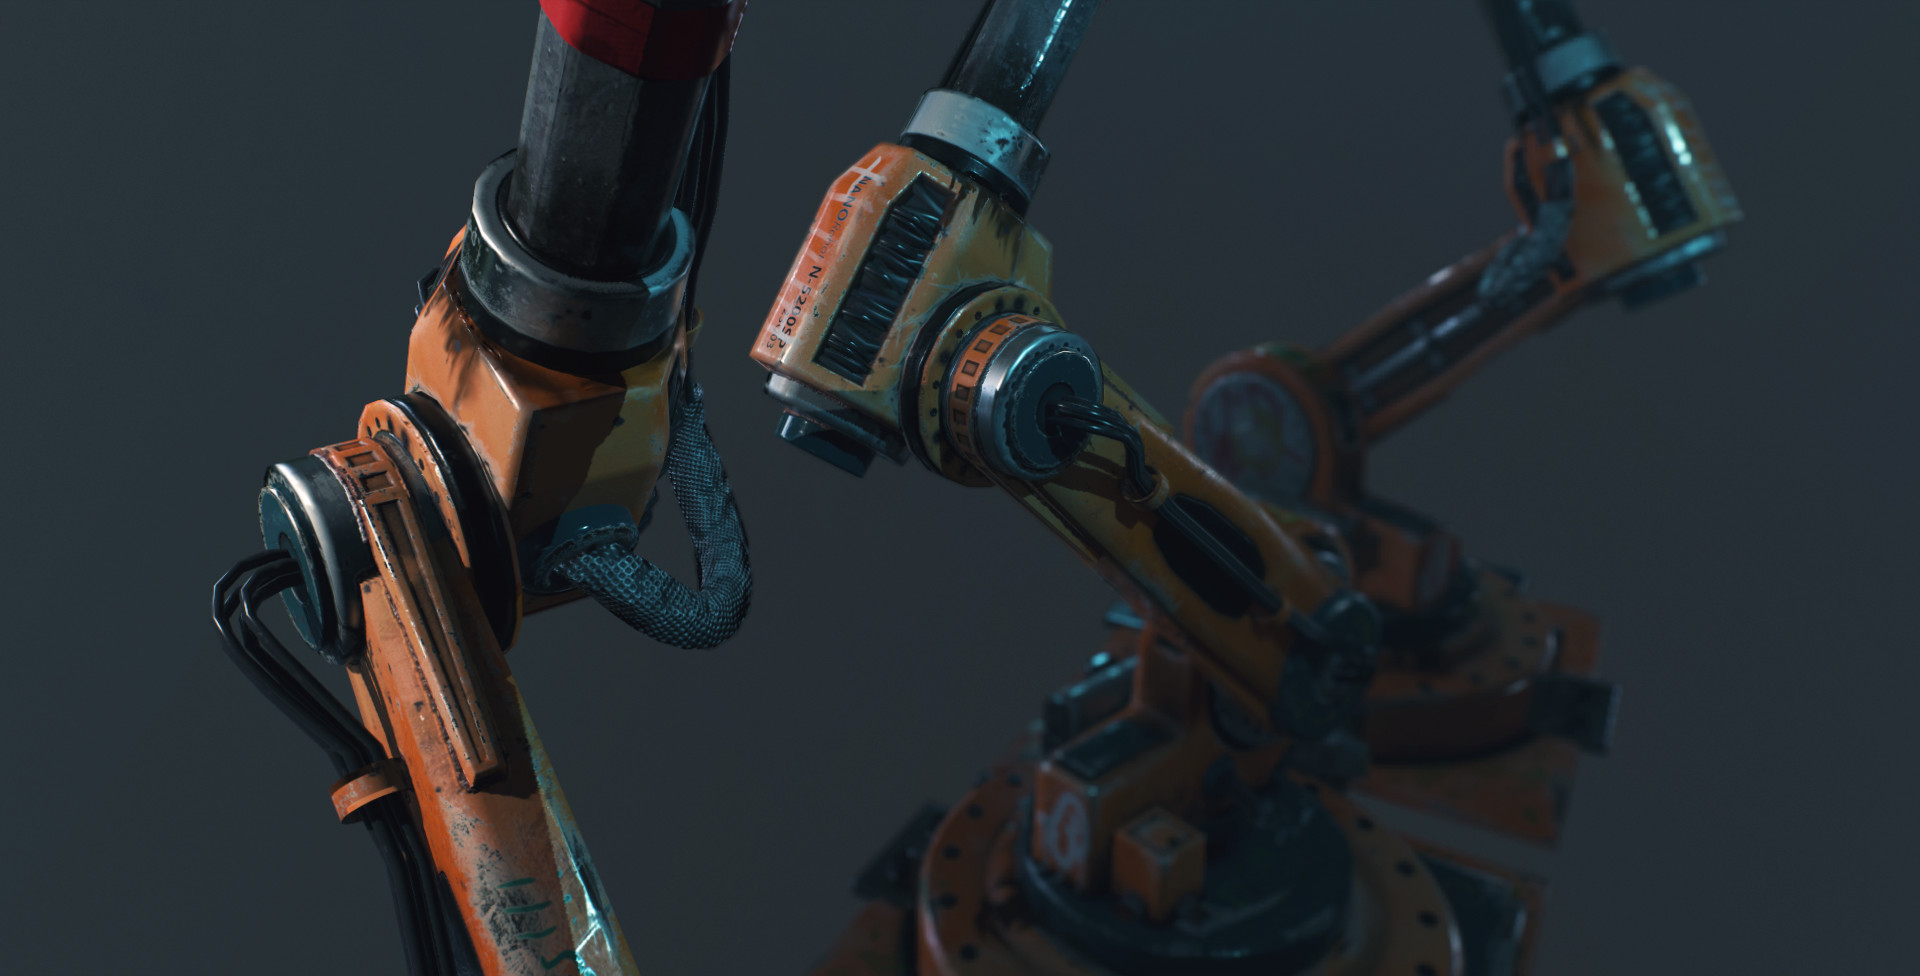 Leonardo iezzi robotam leonardo iezzi 02